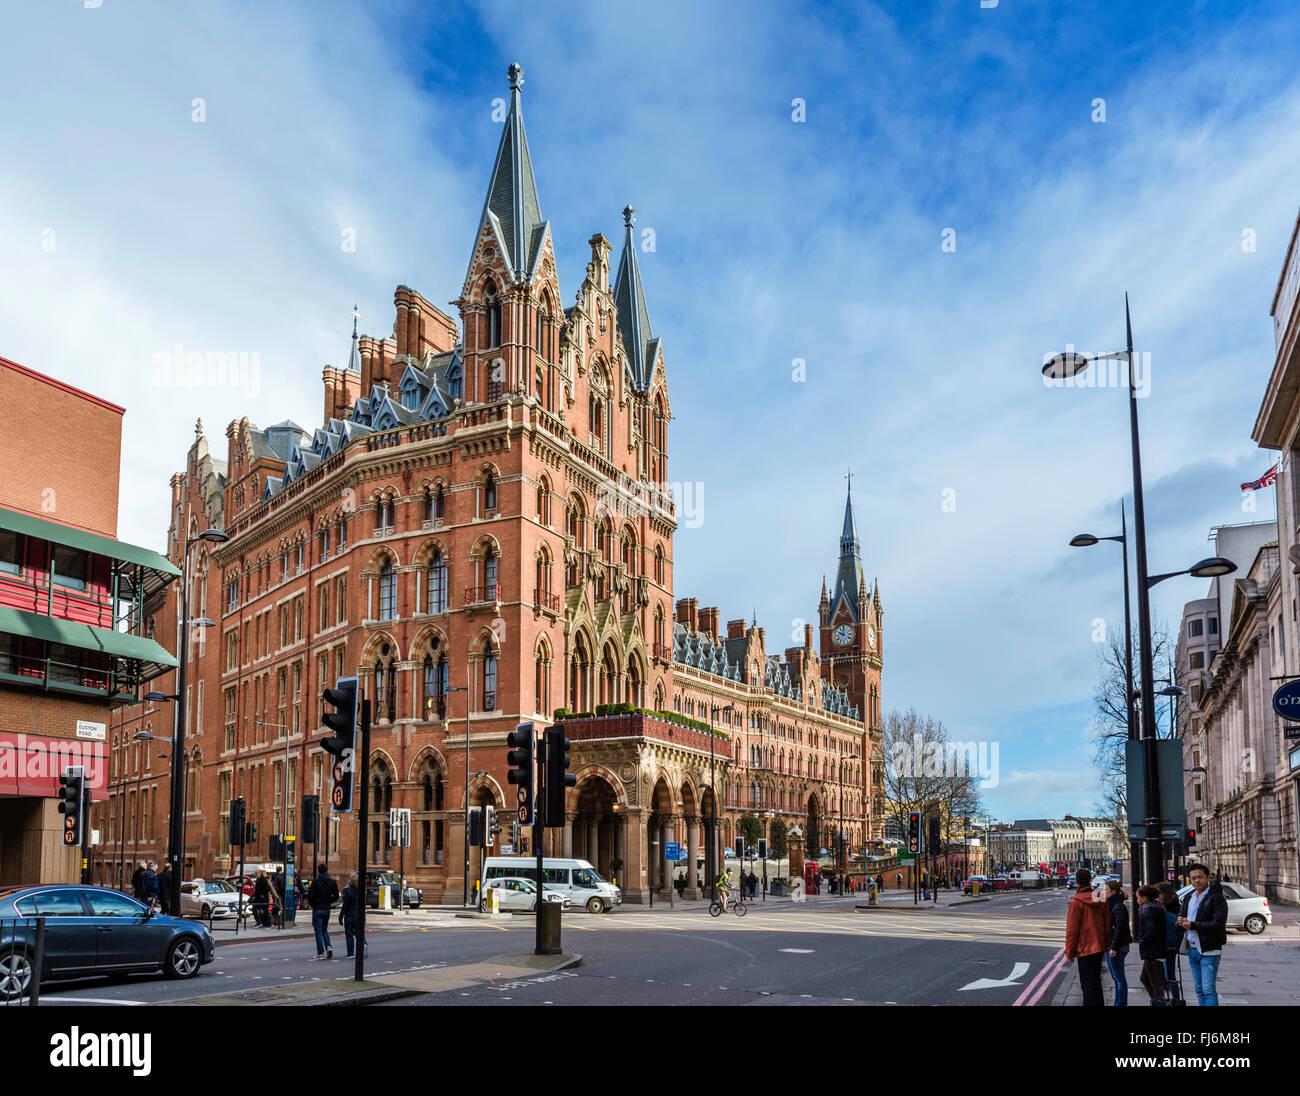 St Pancras International Station incorporating St Pancras Renaissance London Hotel, Euston Road, London, England, - Stock Image